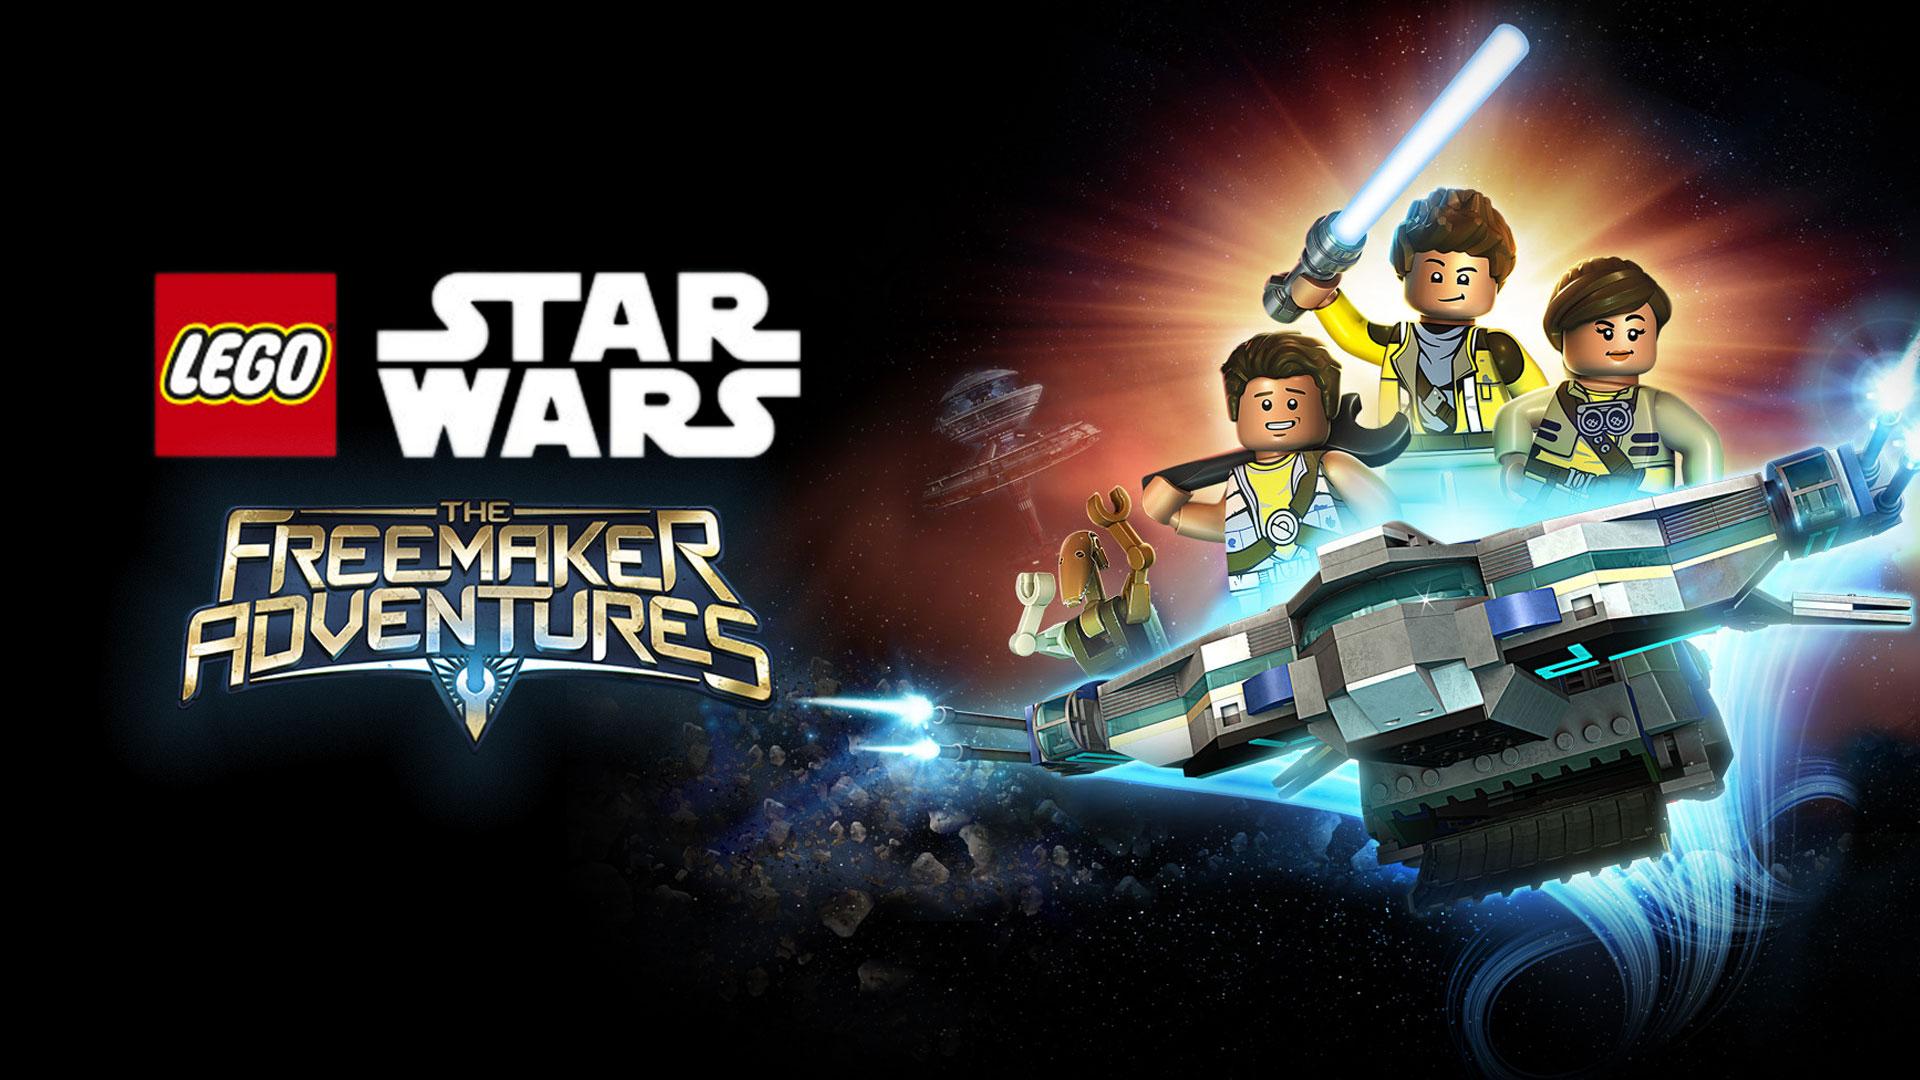 LEGO Star Wars: The Freemaker Adventures Volume 1